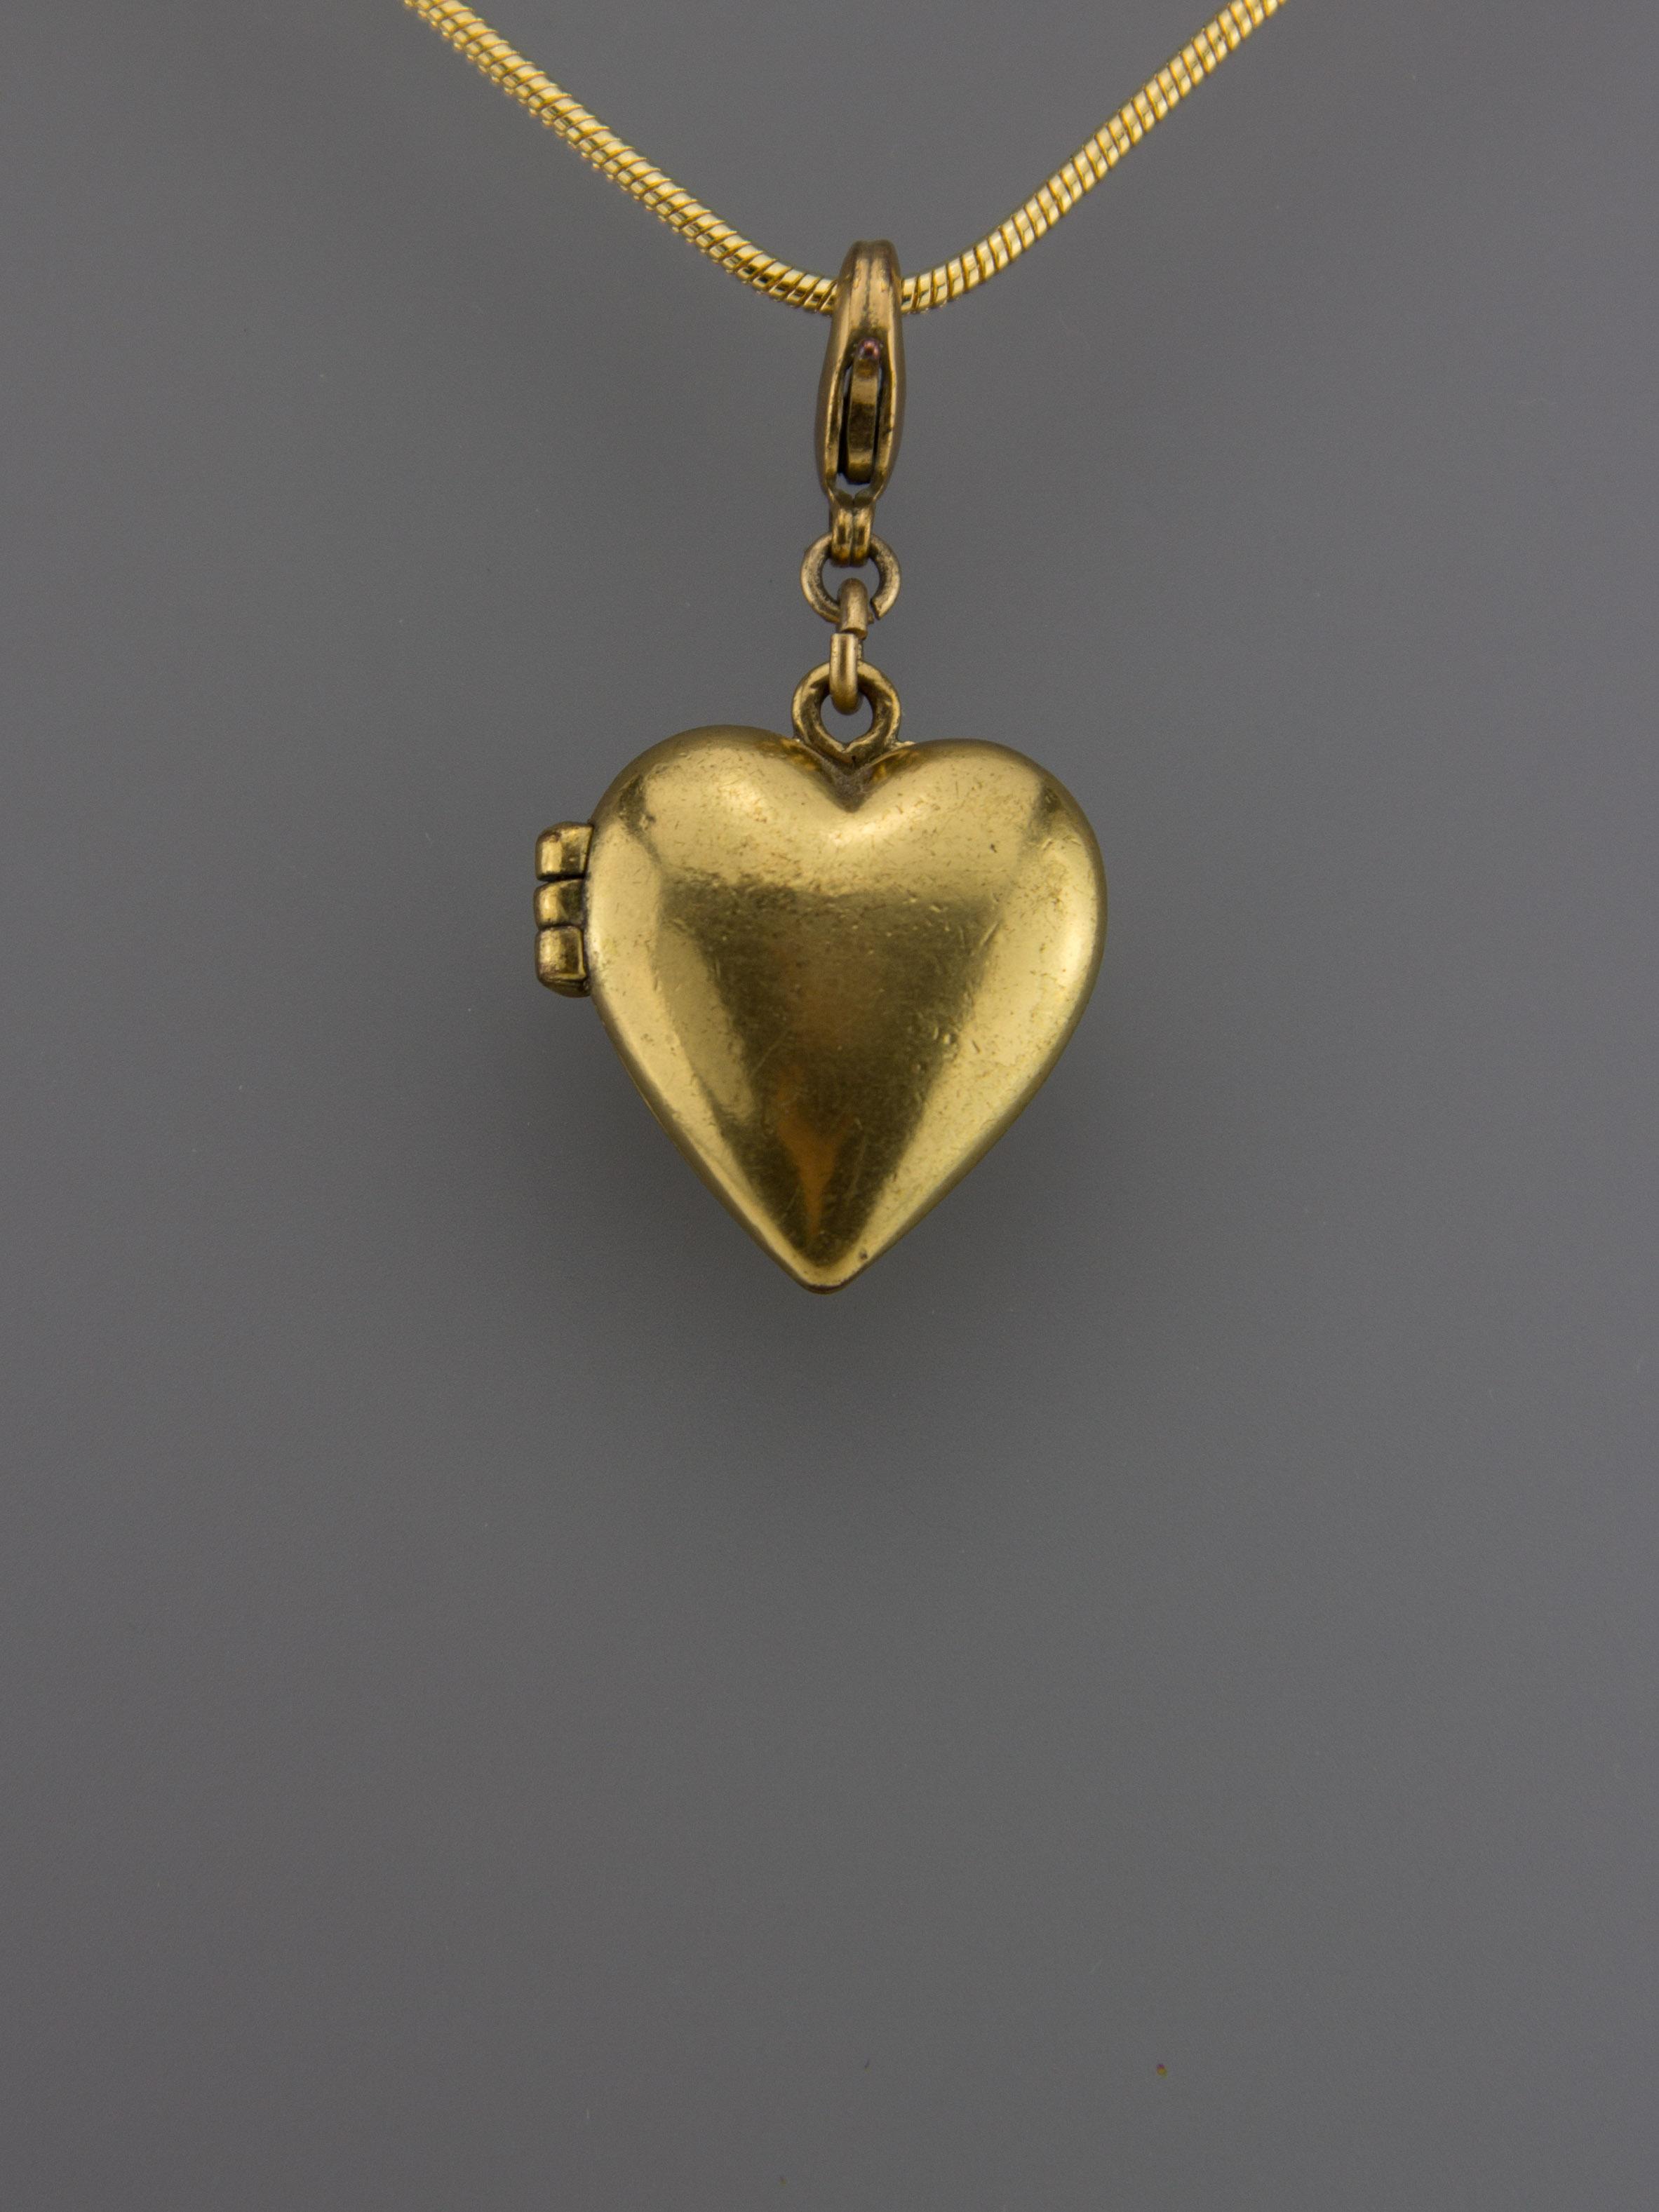 Atemberaubend Pilgrim Herz Medaillon Anhänger - gold – Traumflug Online Shop @WU_77